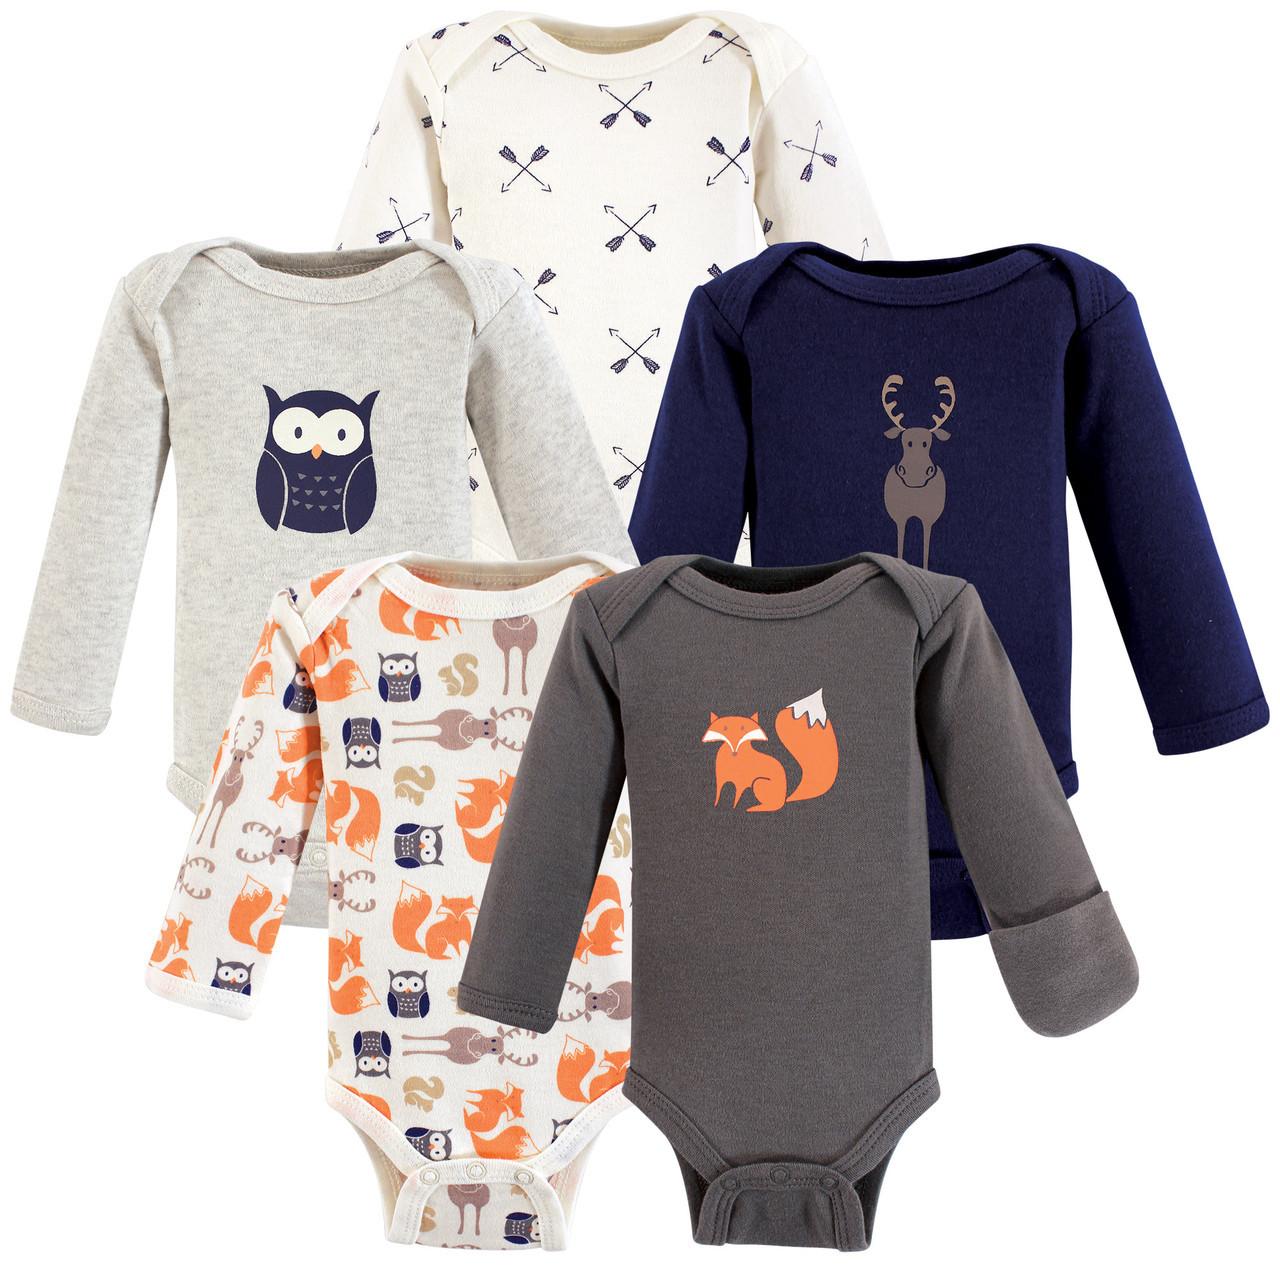 Football 5-Pack Hudson Baby Boy Long-Sleeve Bodysuits